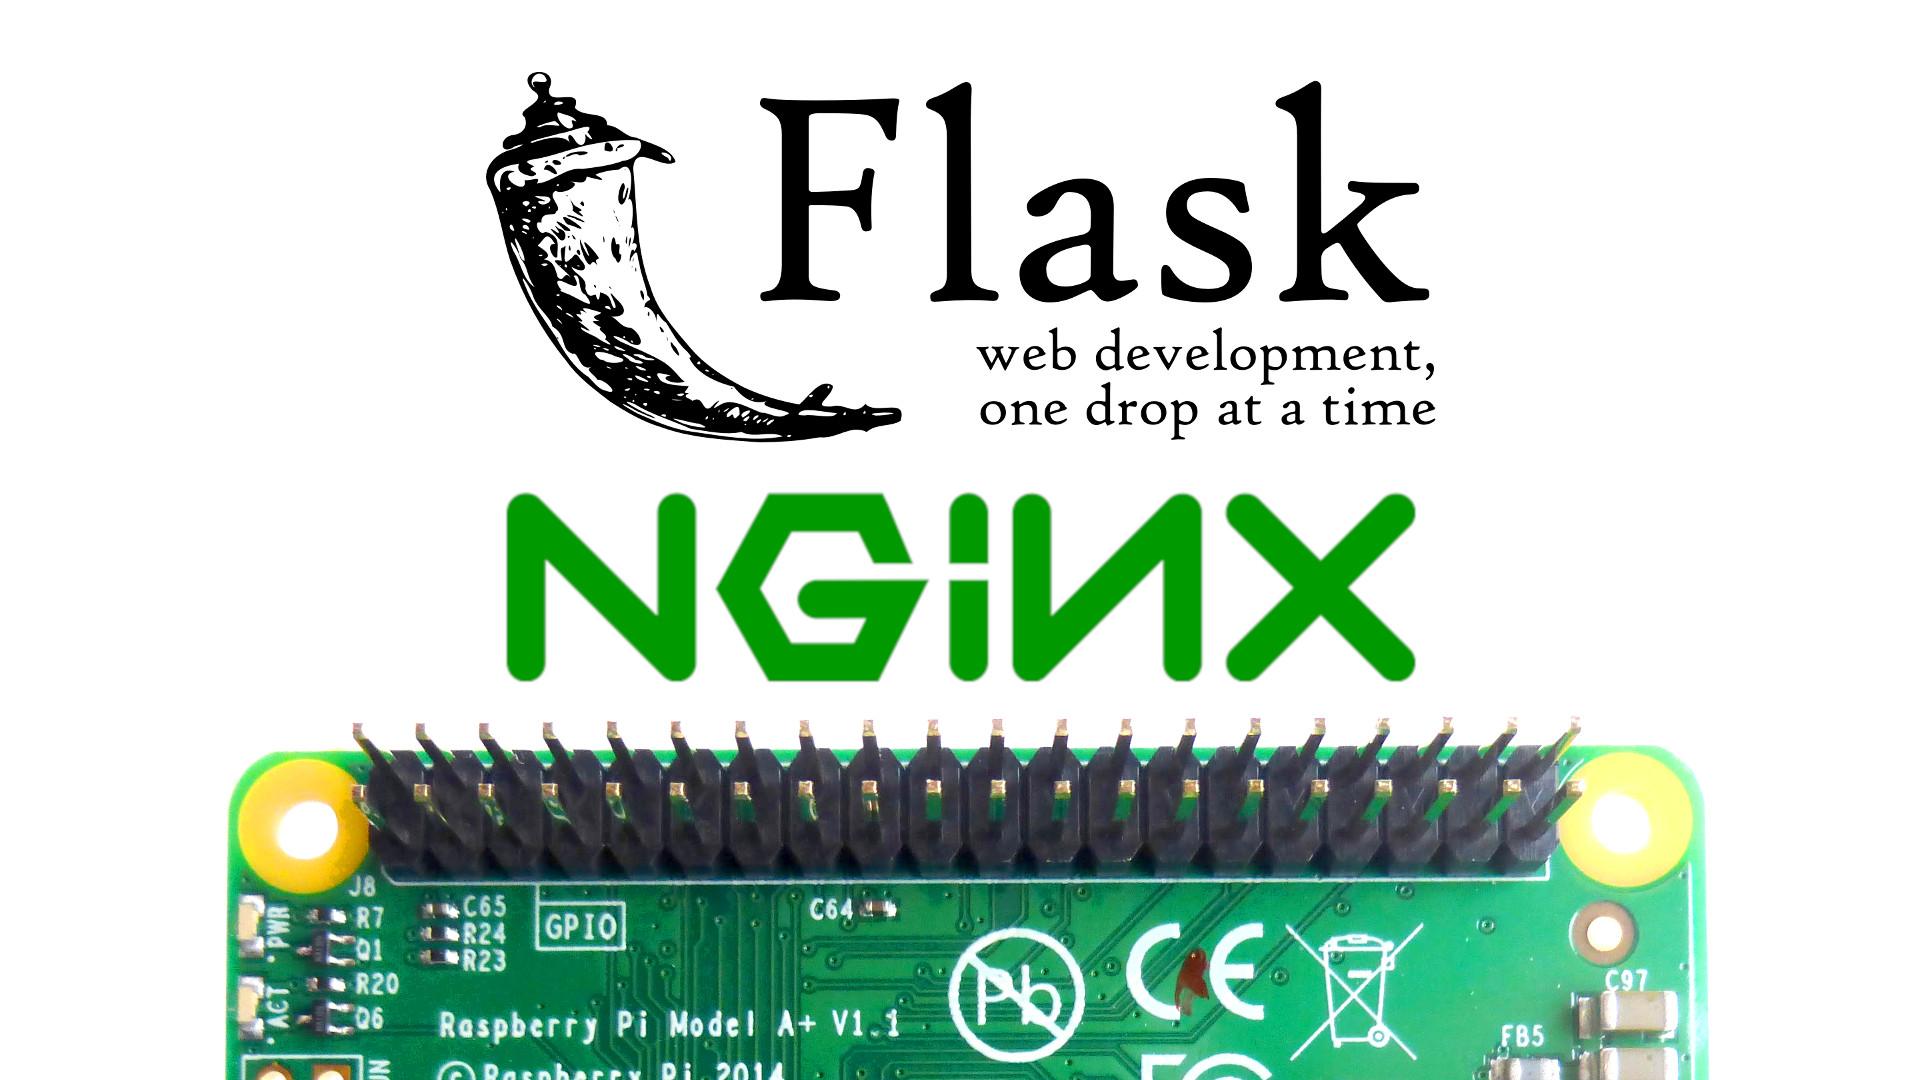 pip3 install flask error